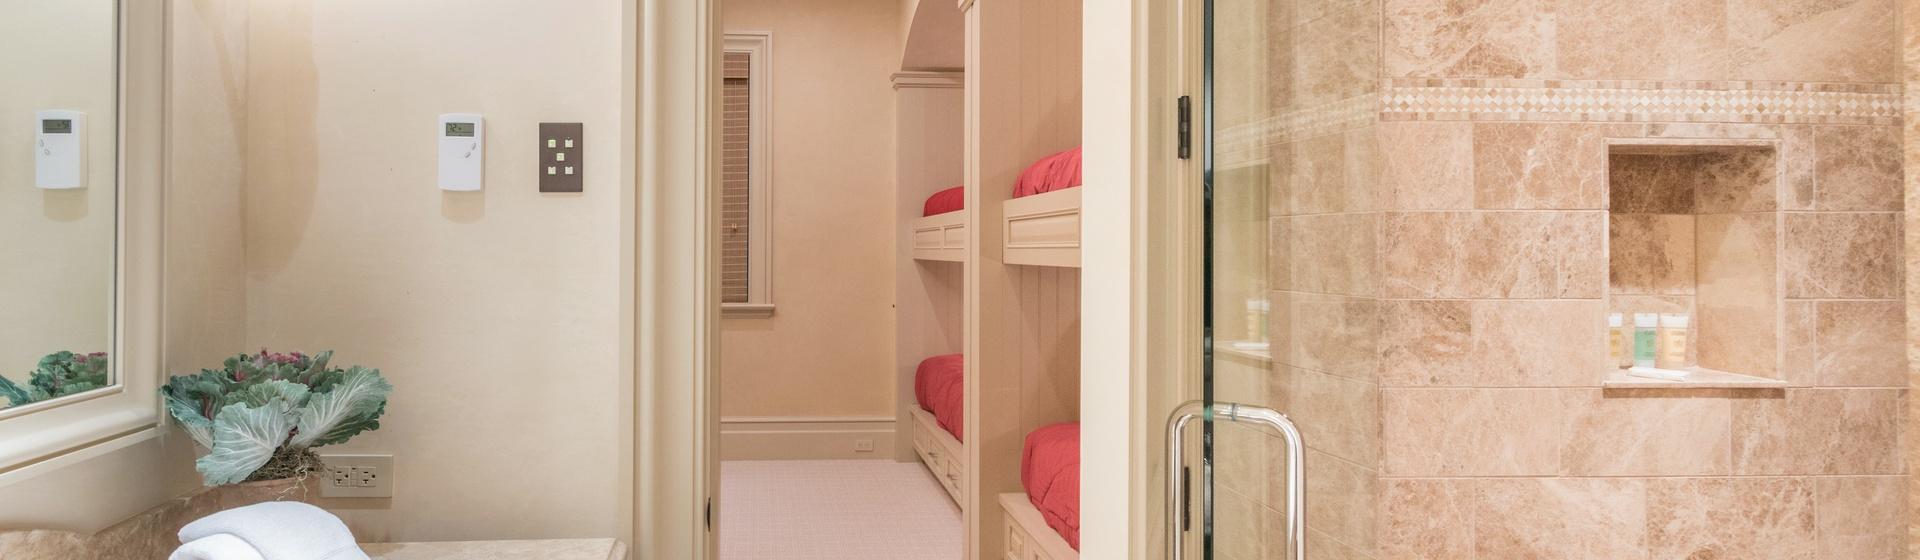 5.20-mountain-village-hood-park-manor-bunk-bedroom-bathroom-track.JPG